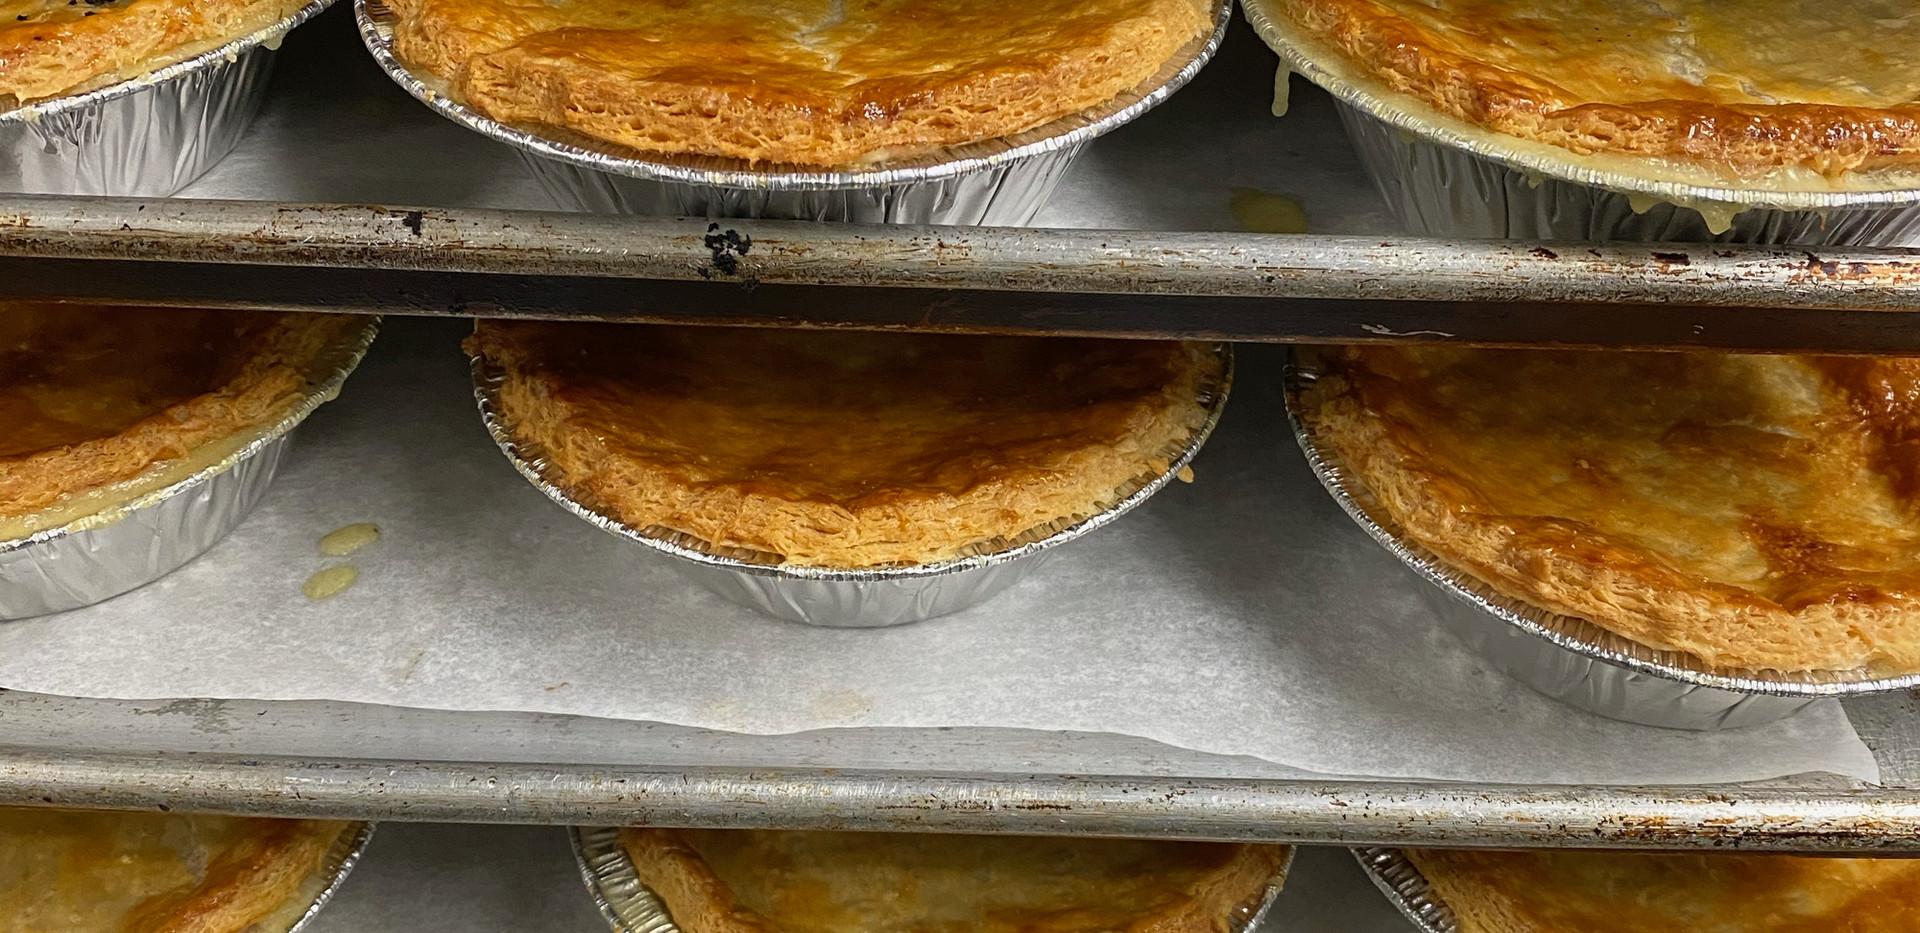 Fresh made pies